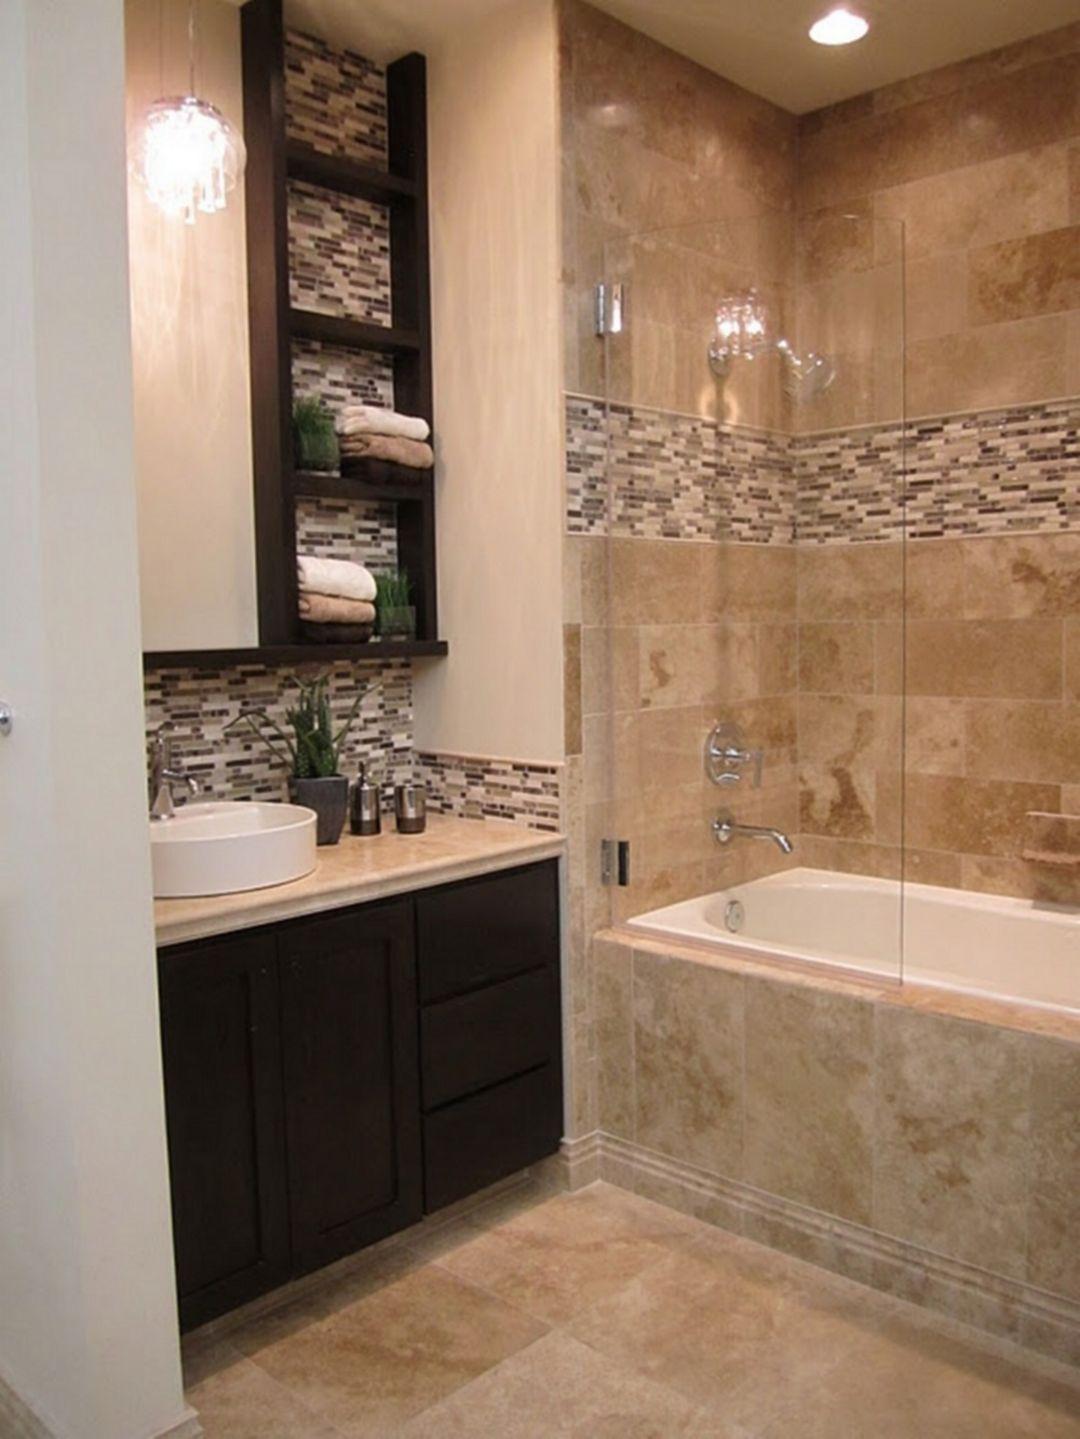 extraordinary bathroom design tile showers ideas | Extraordinary Bathroom Shower Ideas for Small Bathroom 102 ...